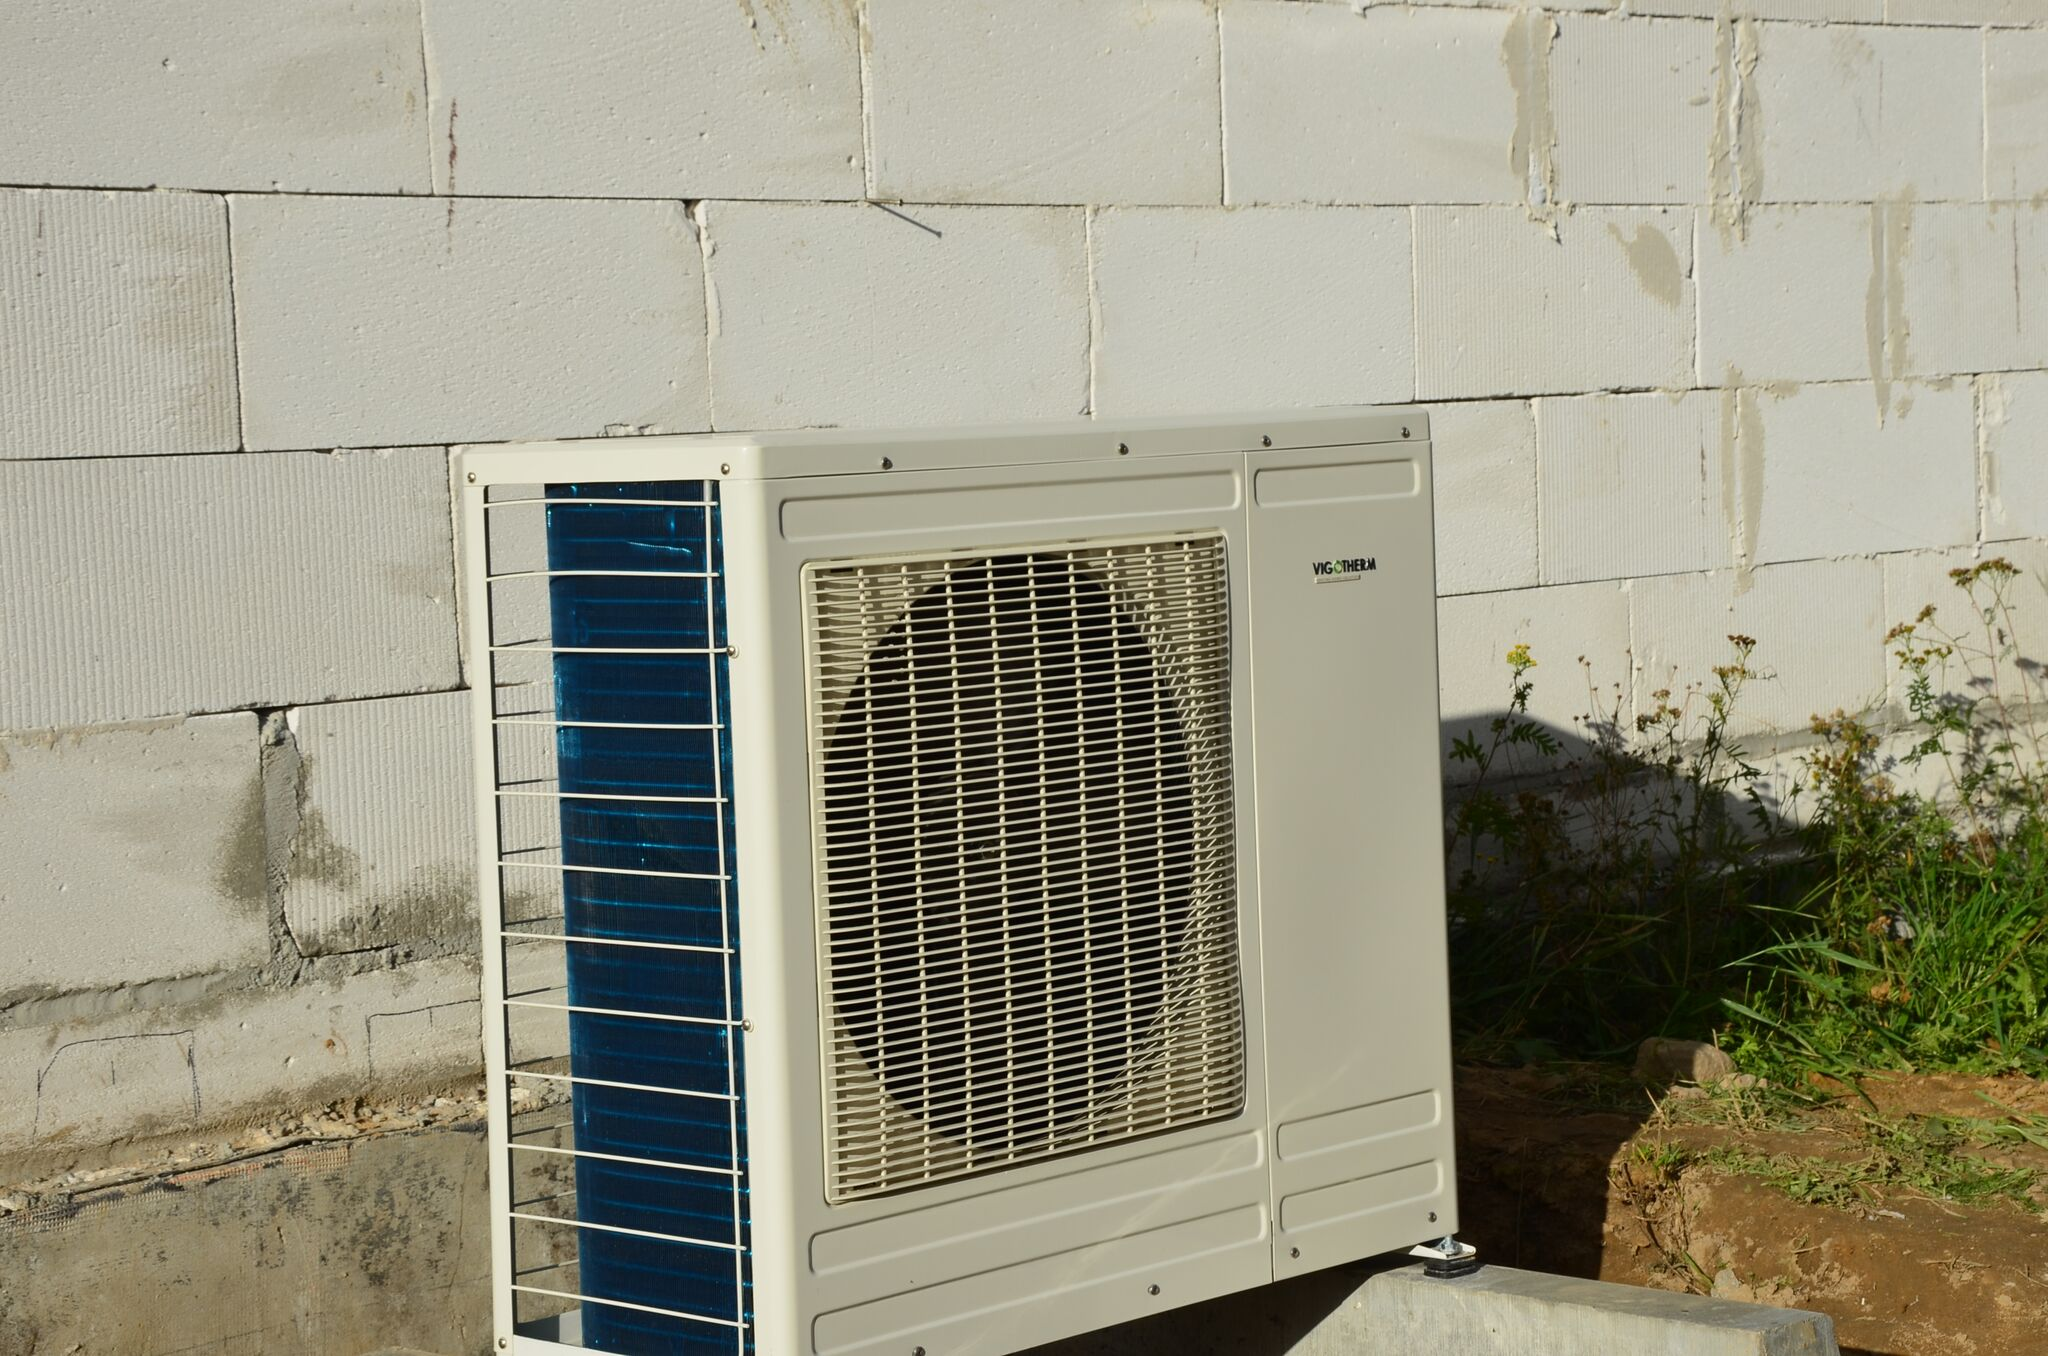 Pompa ciepła Vigotherm AERO 9 w Kolbudach